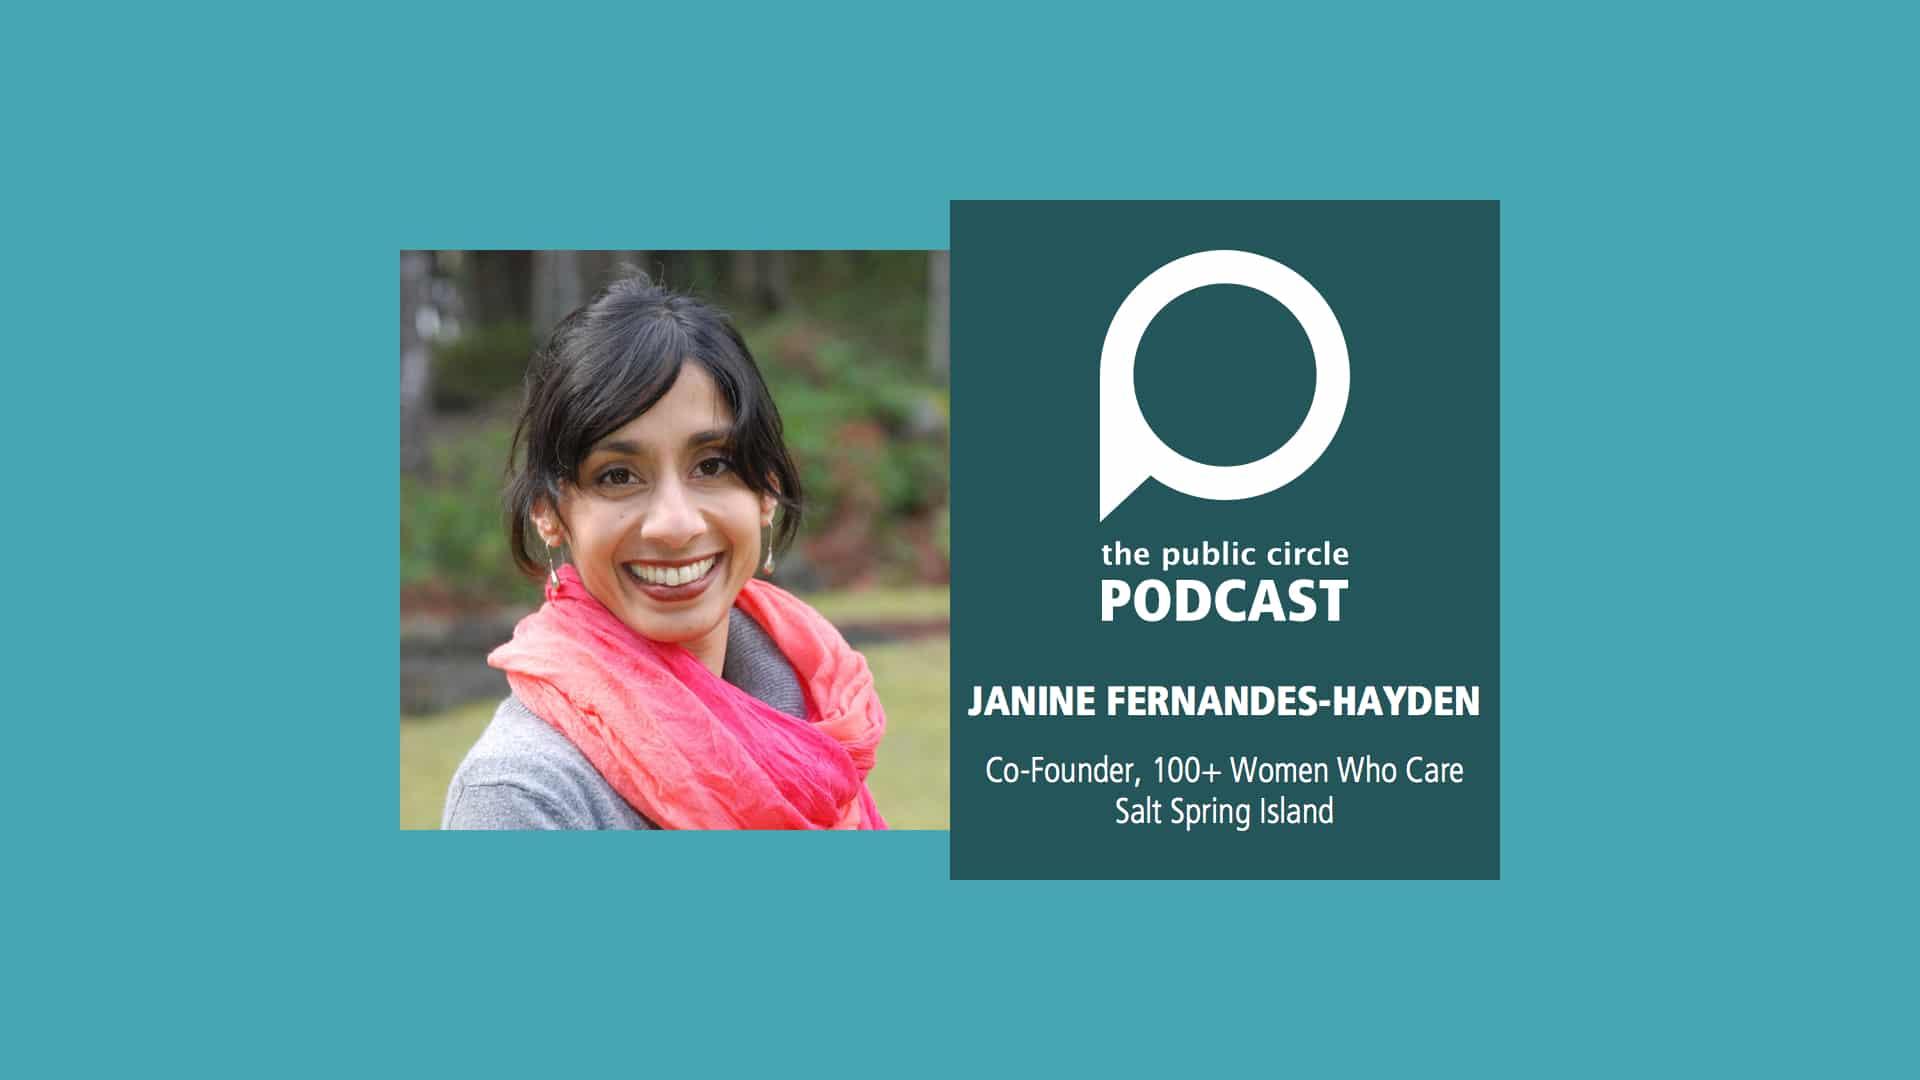 PODCAST: Janine Fernandes-Hayden – 100+ Women Saltspring